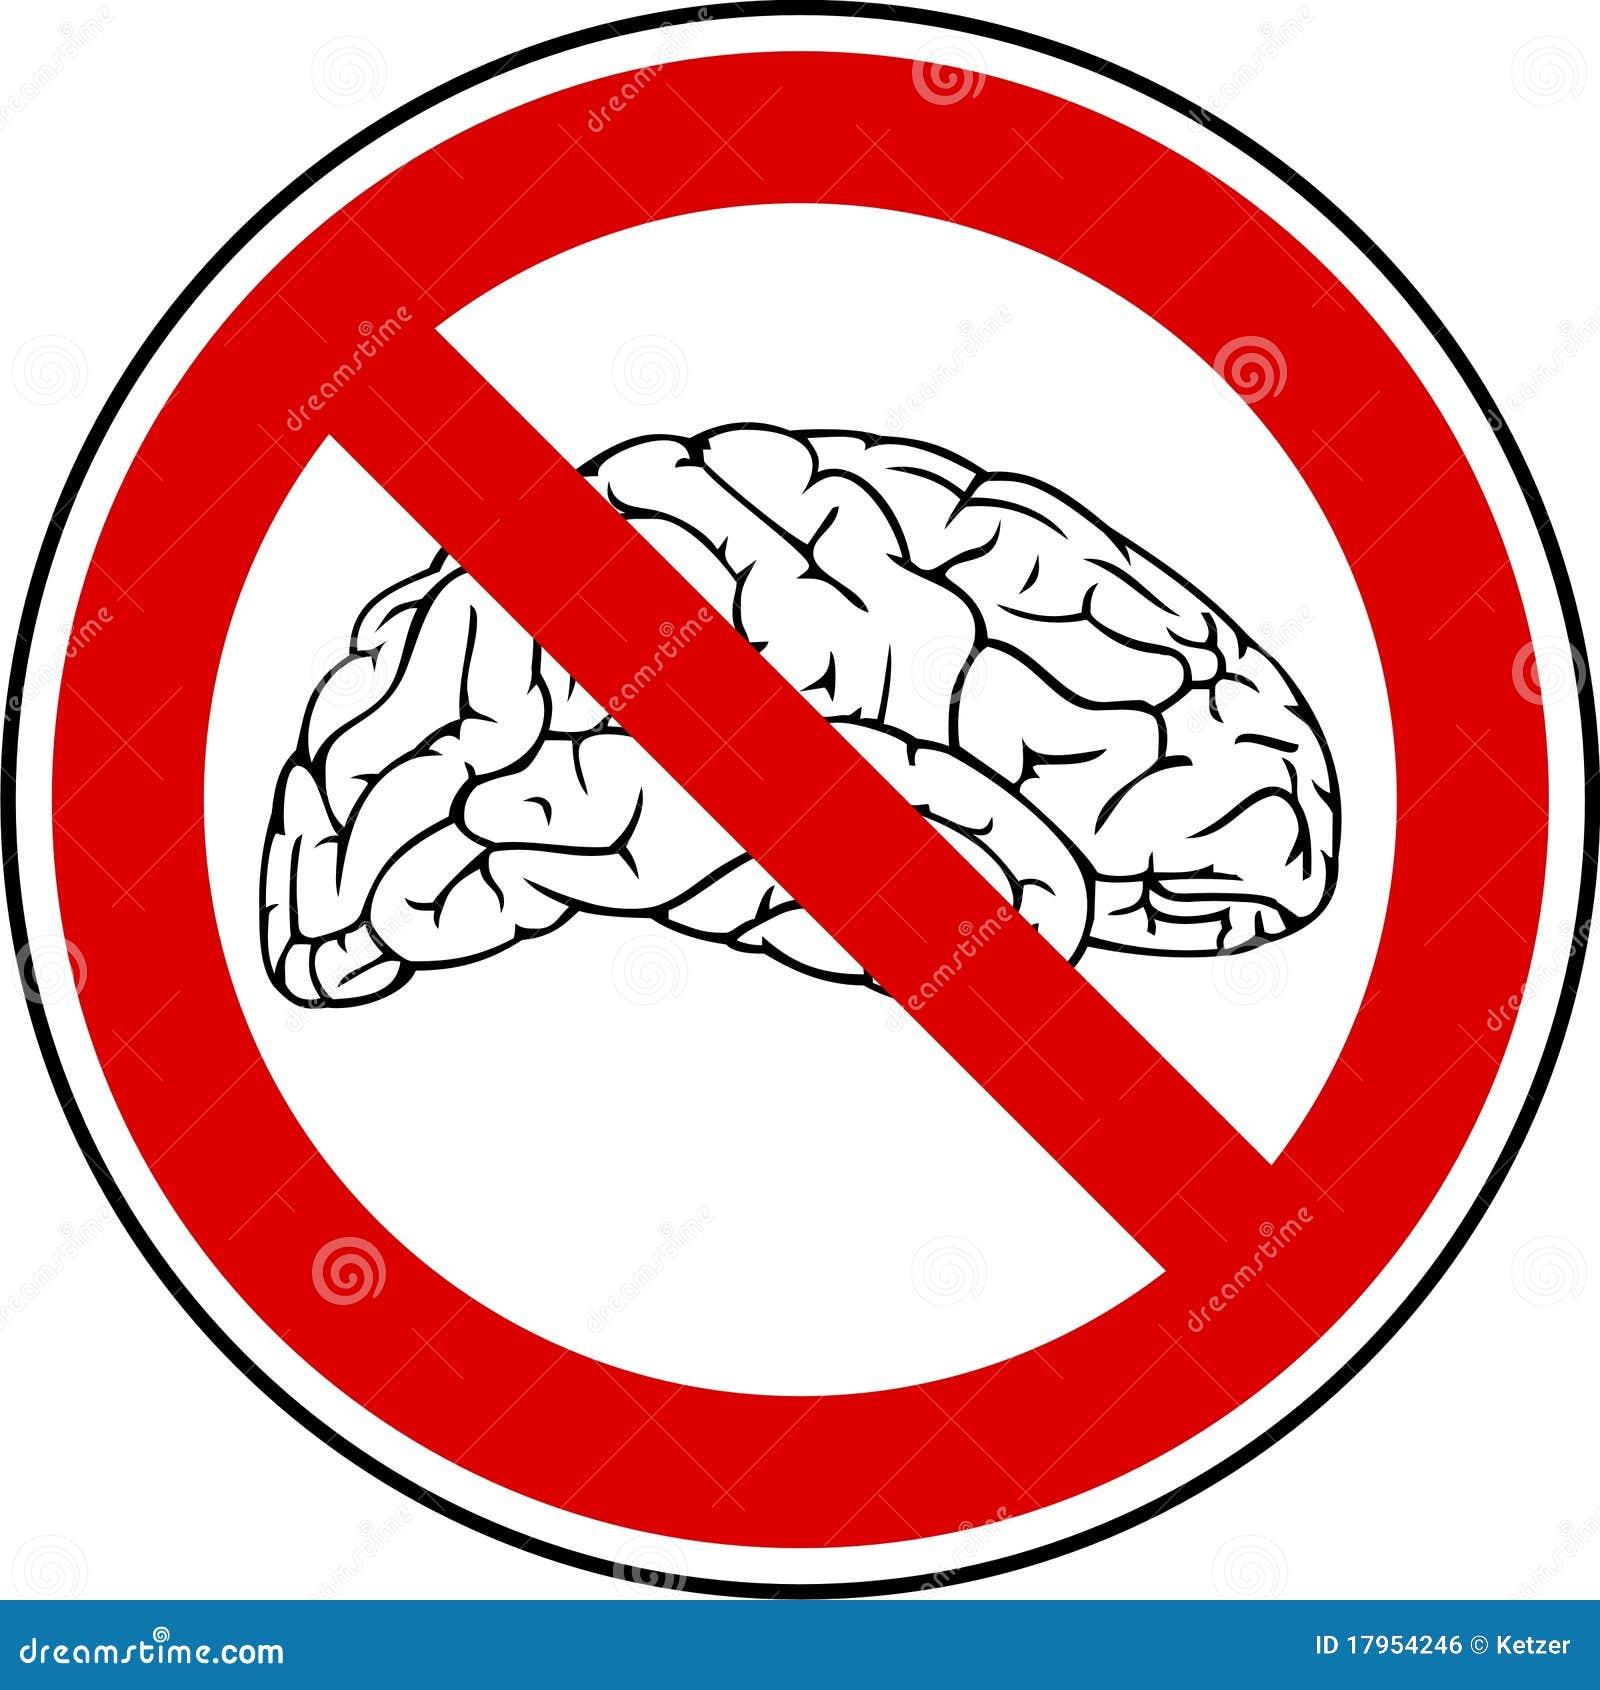 No Brain - No Pain Royalty Free Stock Image - Image: 17954246